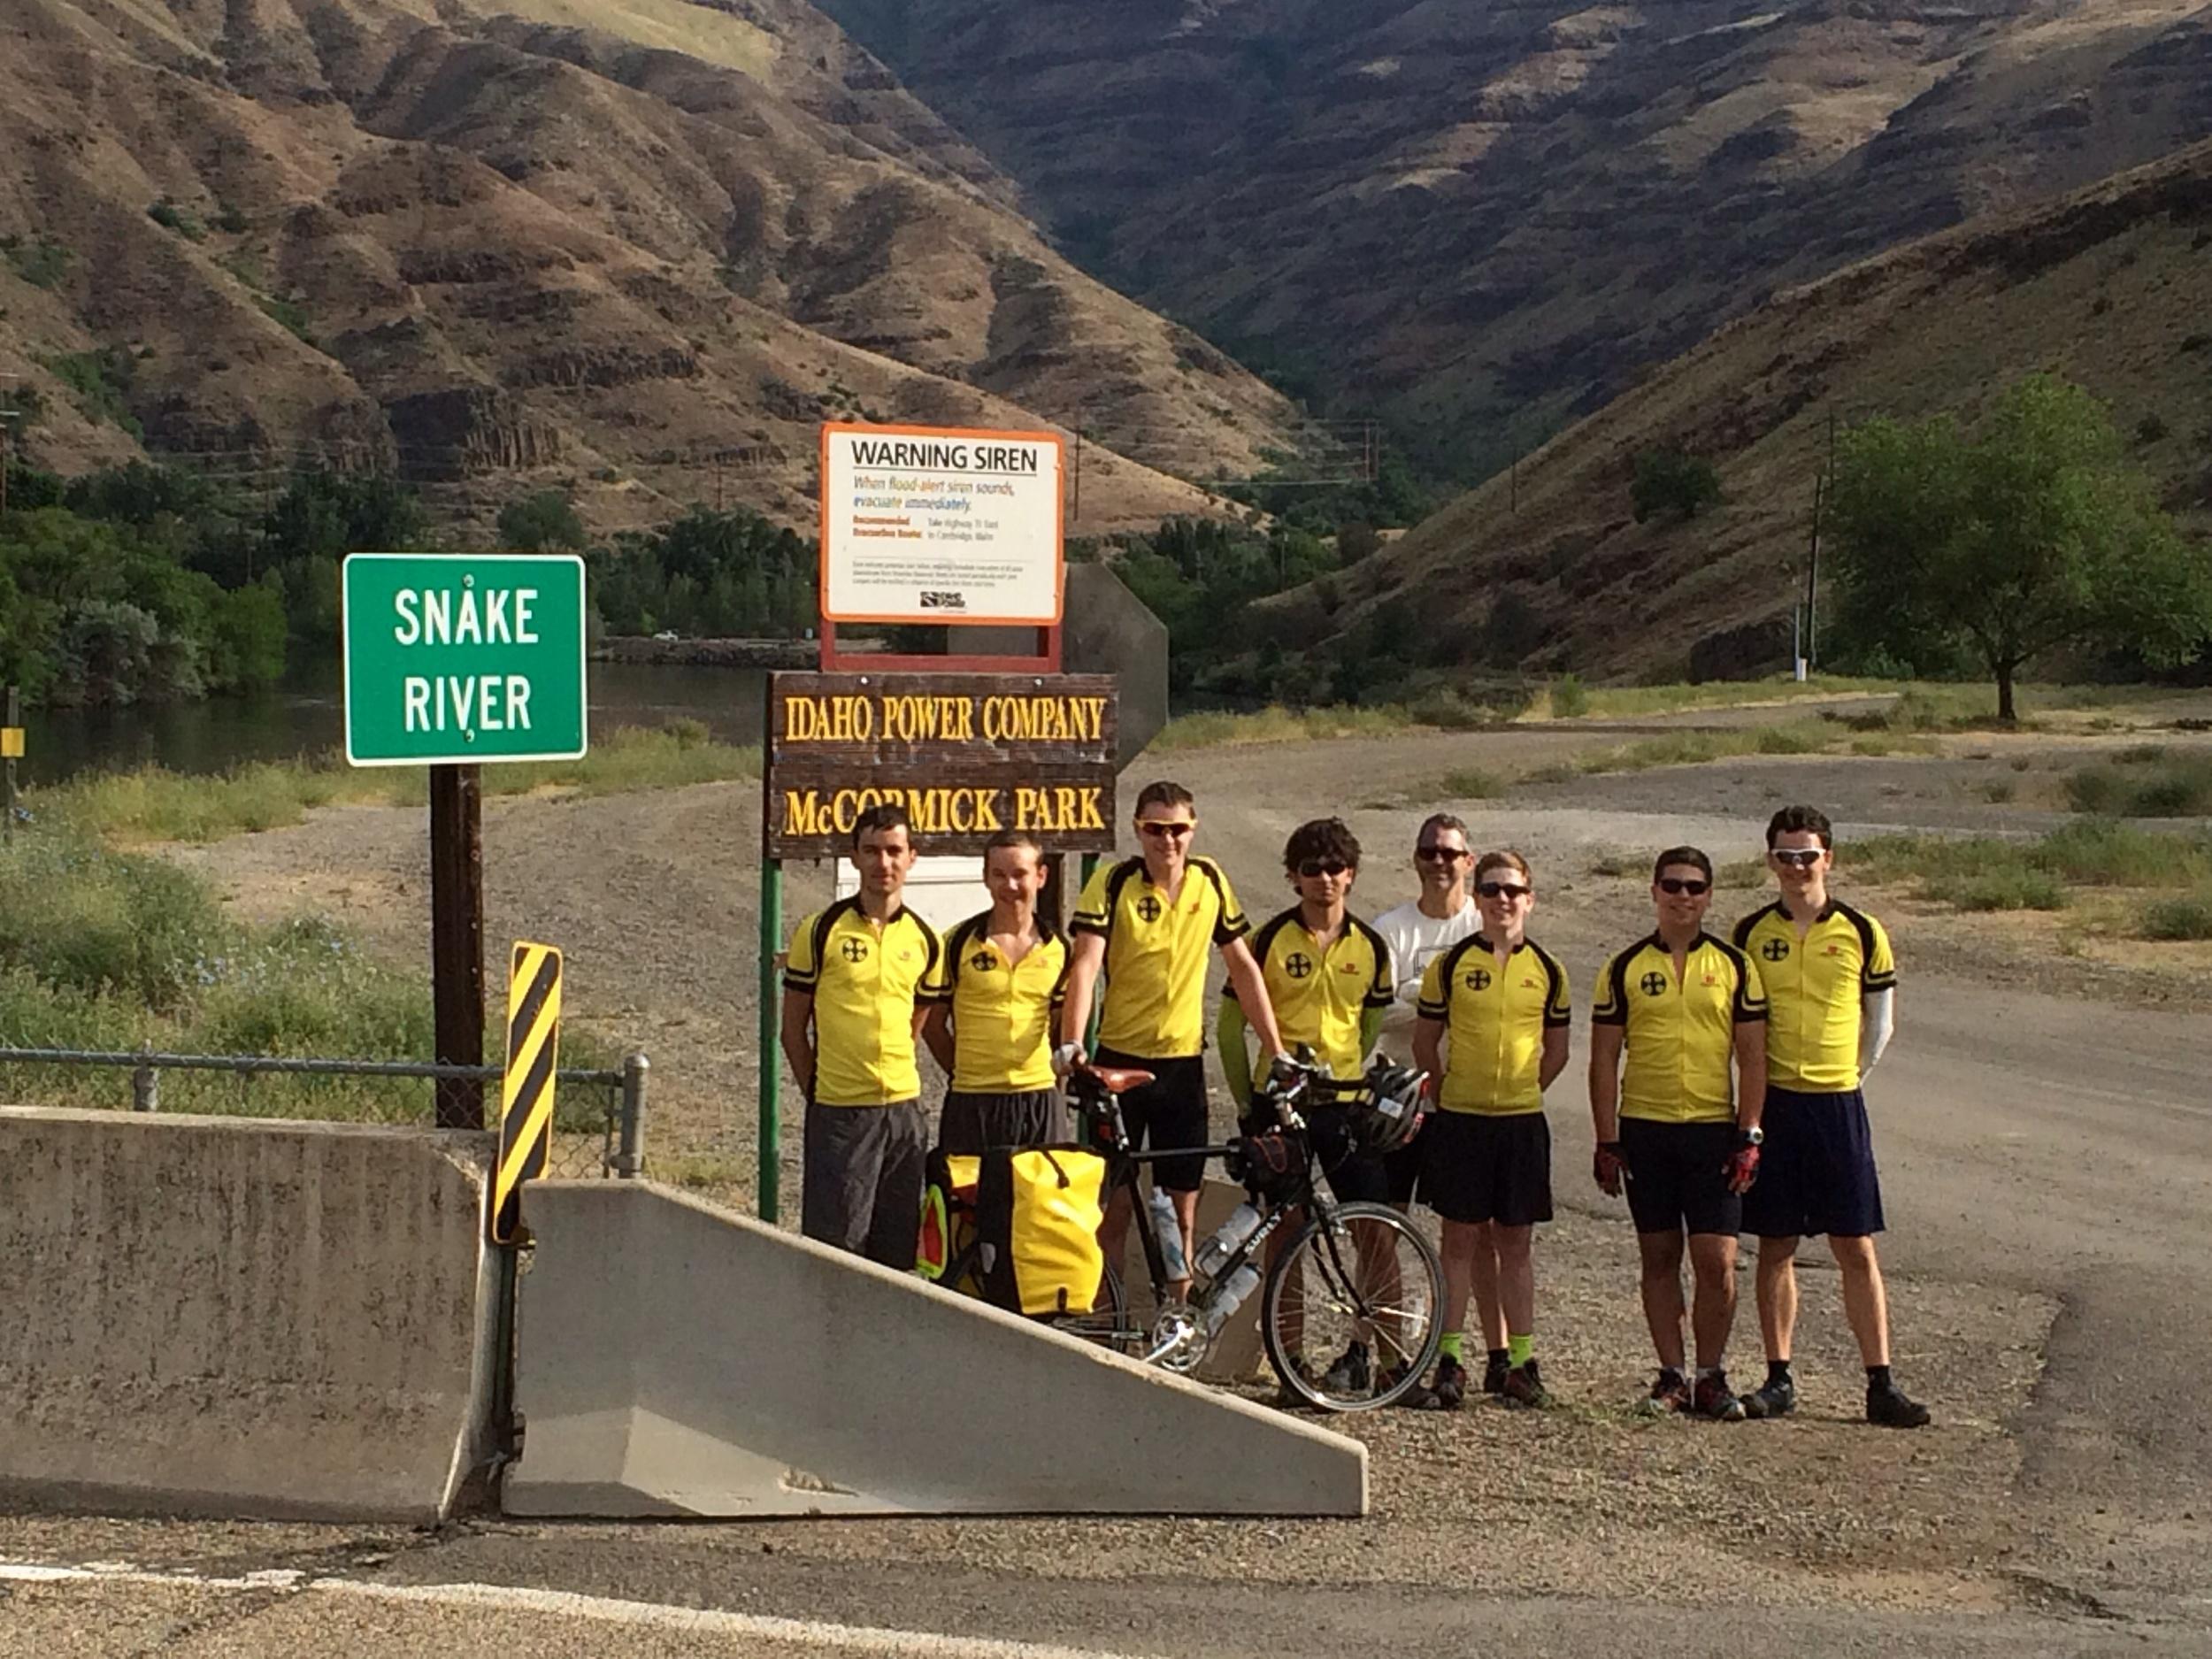 On the Snake River, goodbye Oregon, hello Idaho!